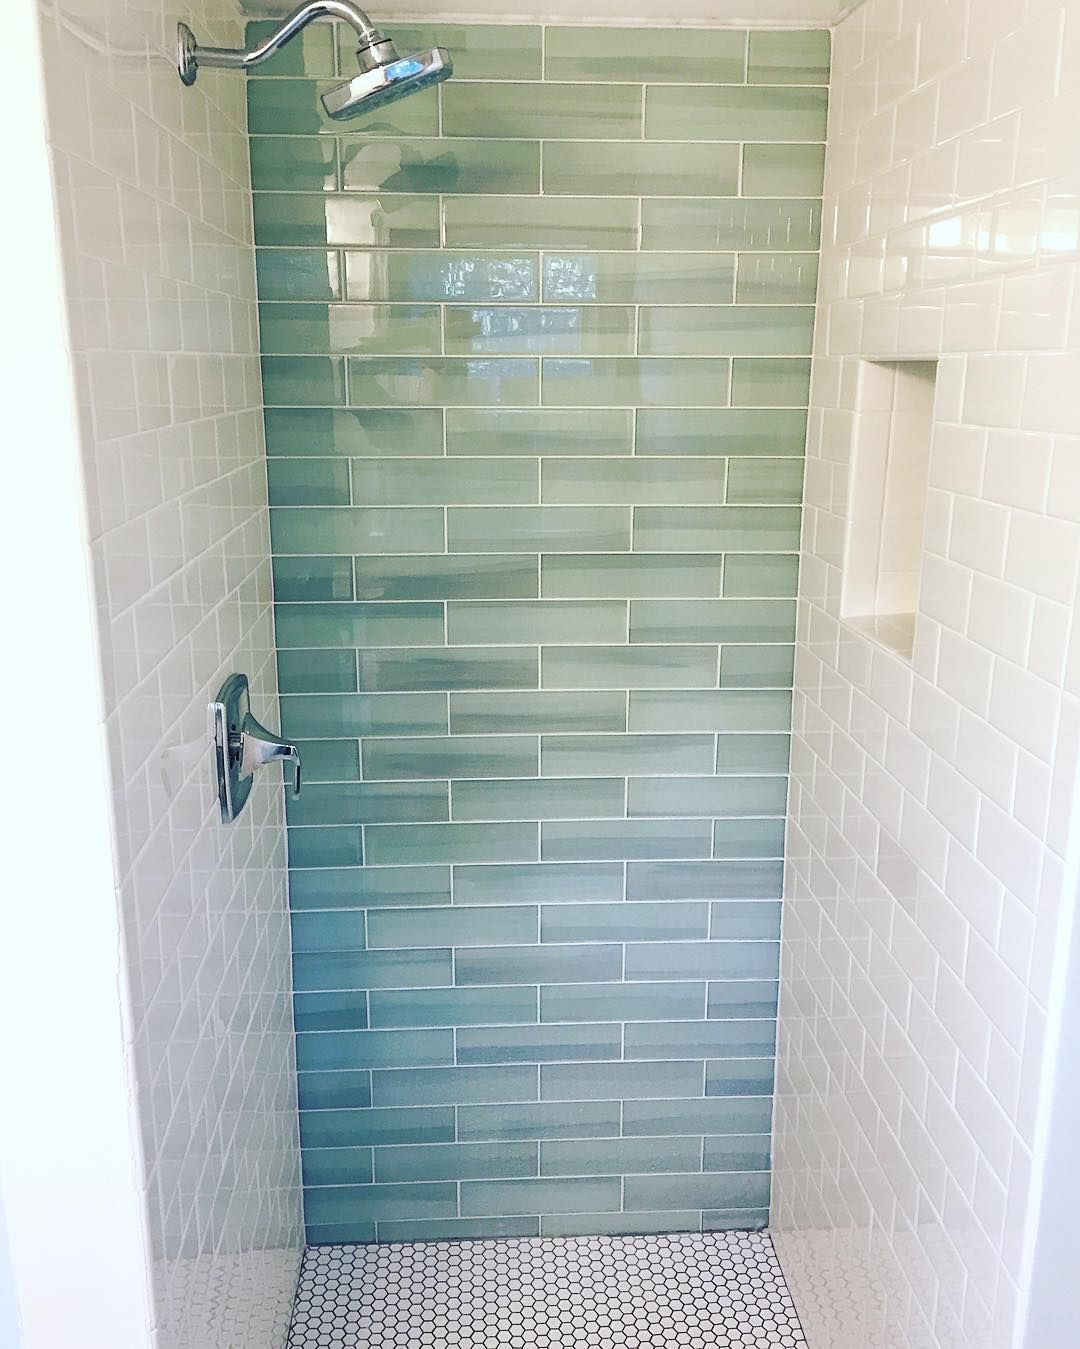 All Time Best Useful Tips Chic Bedroom Remodel Small Bedroom Remodel Room Dividers Bedroom Remo Bathrooms Remodel Small Bathroom Remodel Bathroom Tile Designs